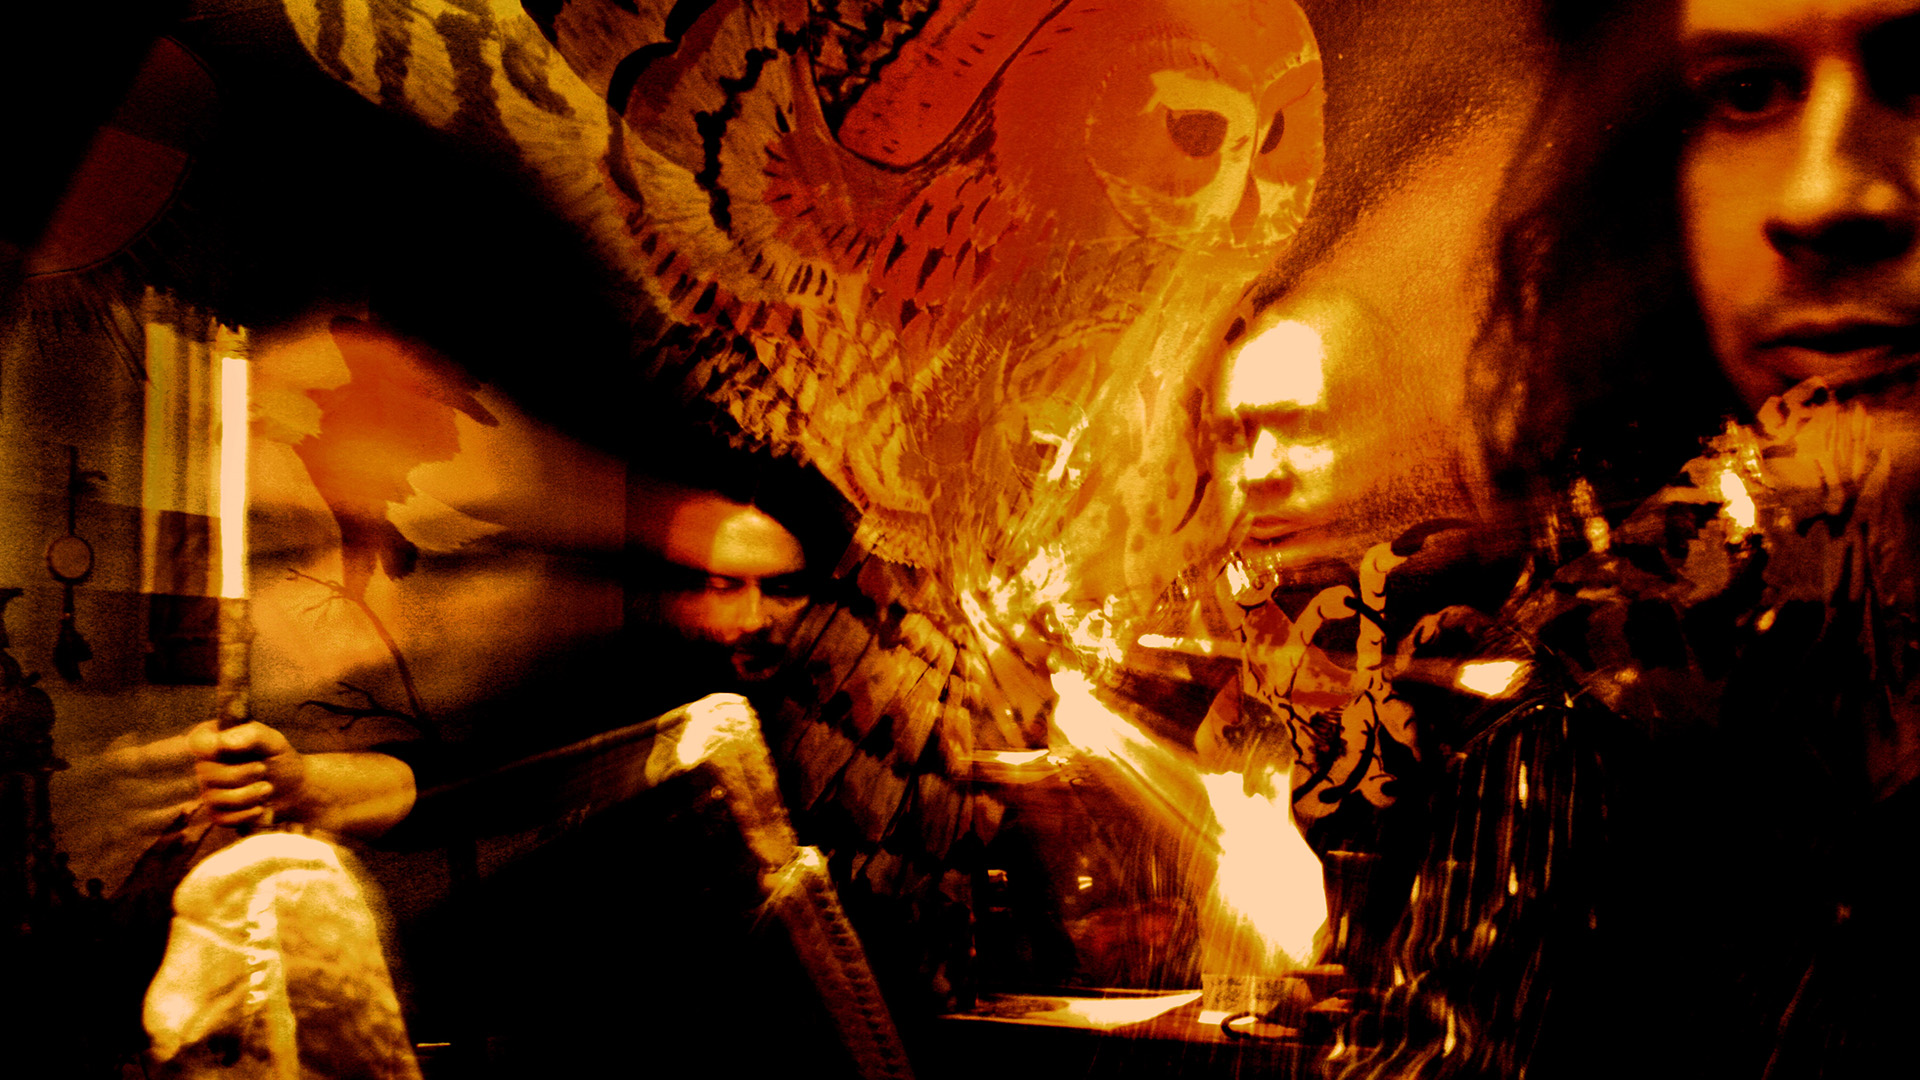 Wolves In The Throne Room Music Fanart Fanart Tv